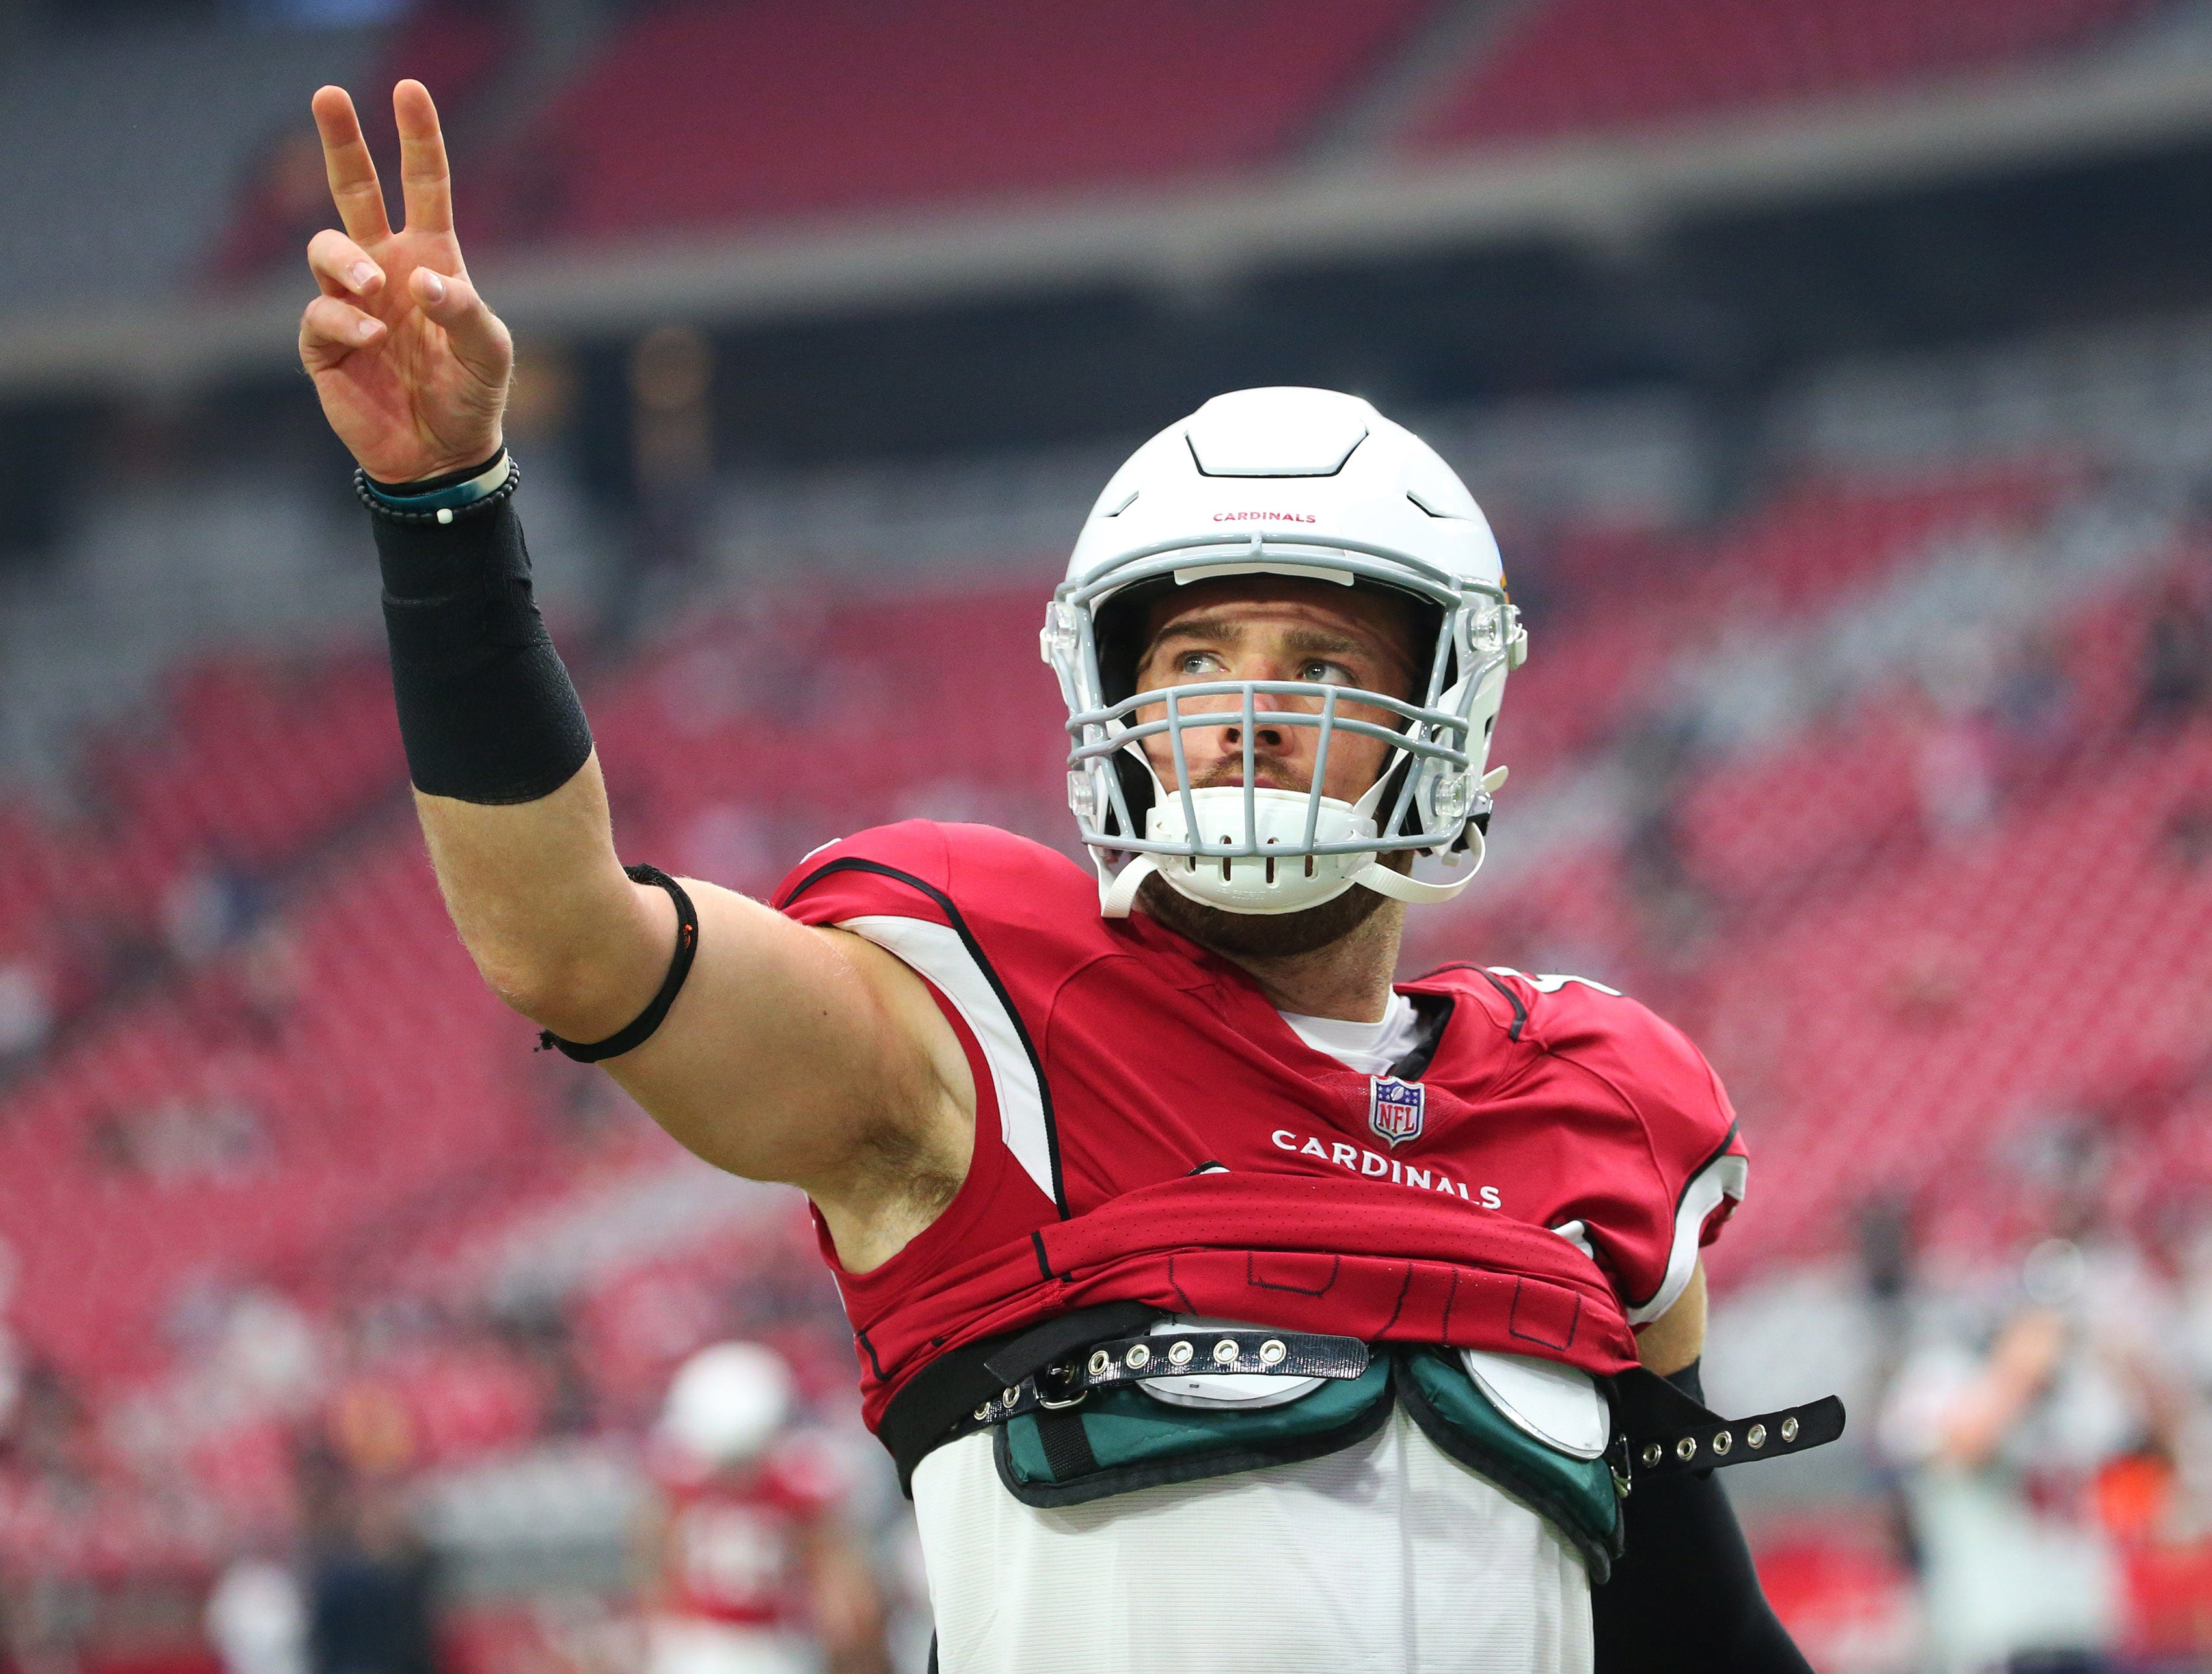 Zach Ertz already looks stellar wearing red, makes history in Cardinals debut